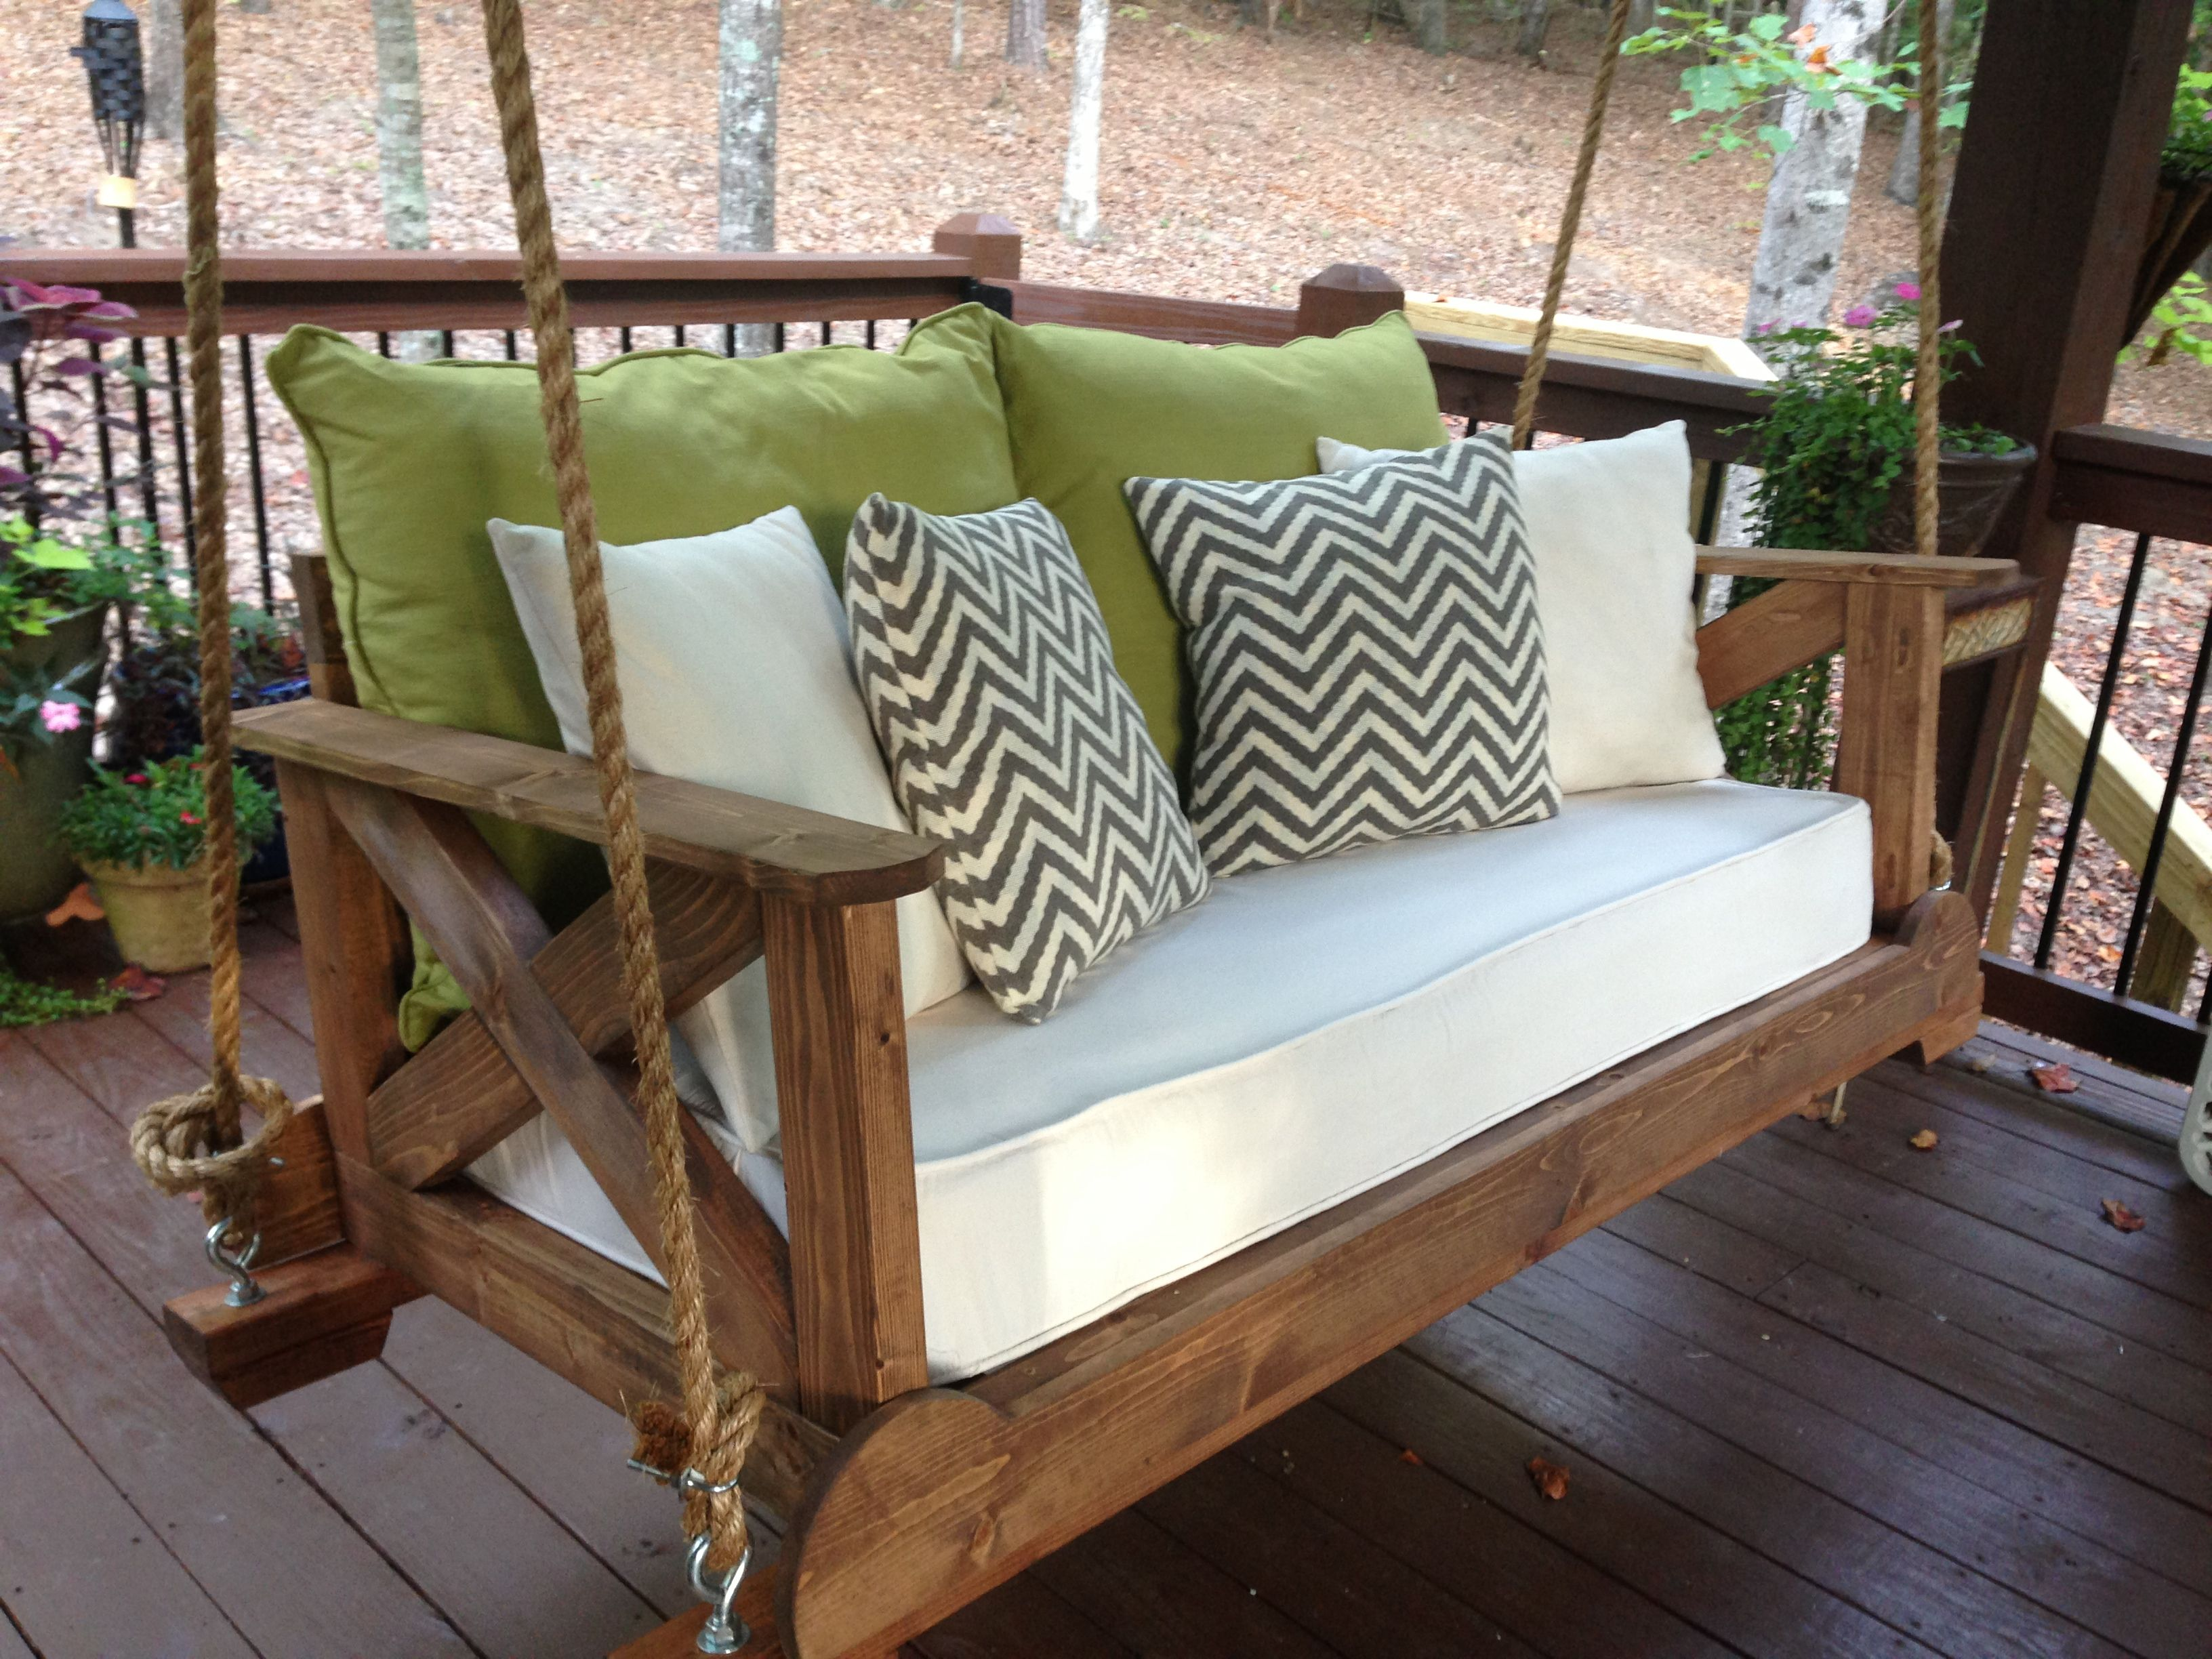 56 Diy Porch Swing Plans Free Blueprints Diy Porch Swing Bed